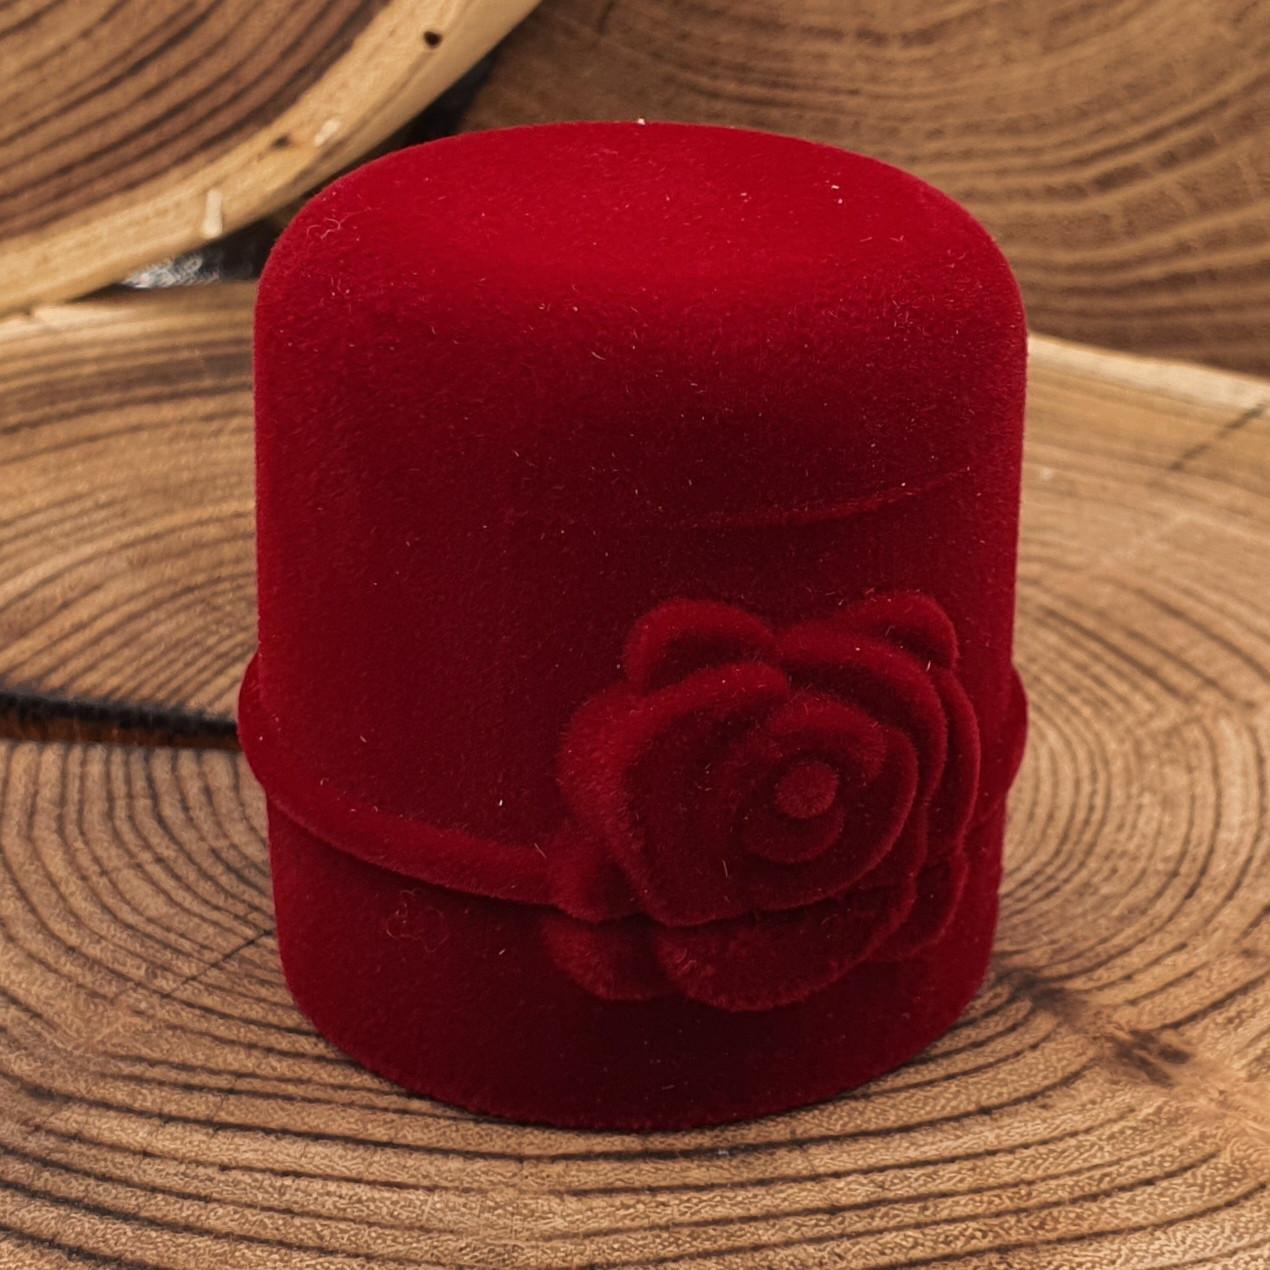 Футляр для колец-серег 740145 бордовый бархат размер  5*4,5 см